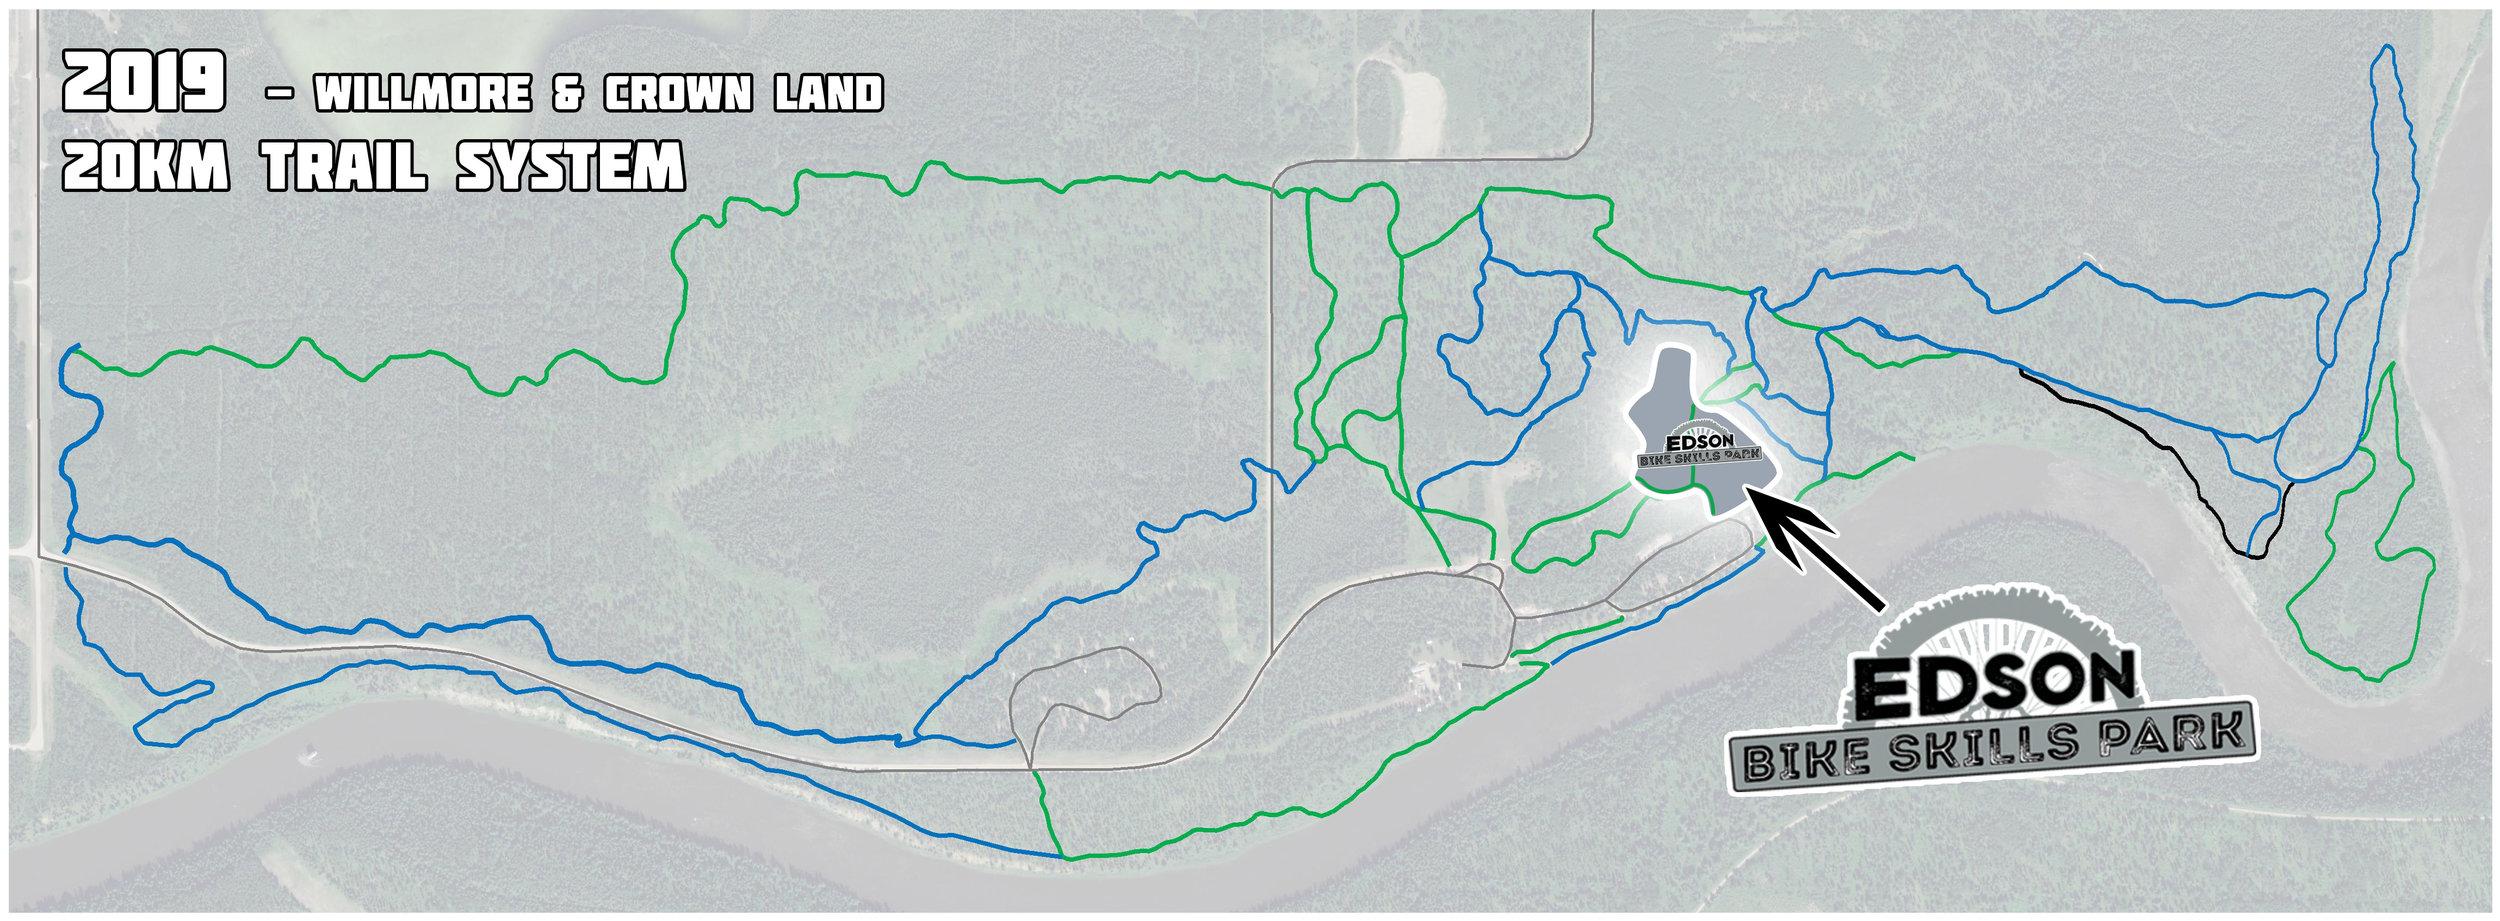 2019 trail system with Edson Bike Skills Park.